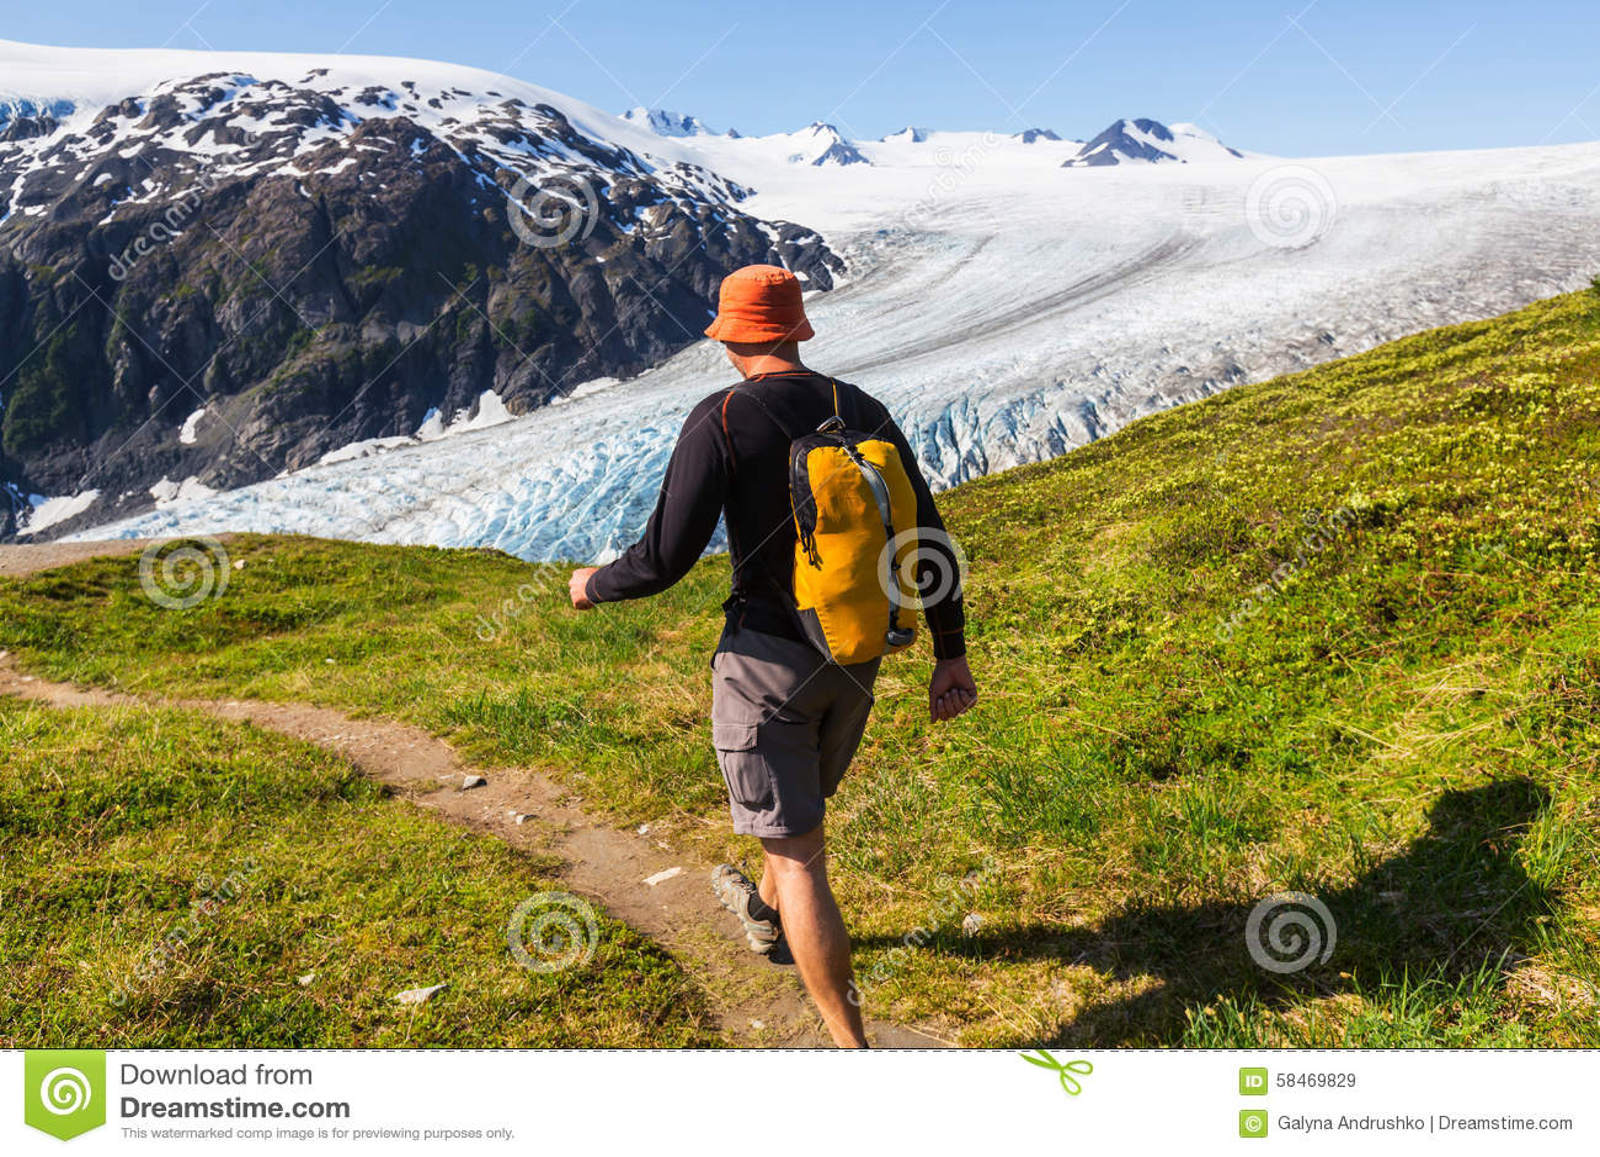 Hike In Exit Glacier Stock Image. Image Of Fjords, America